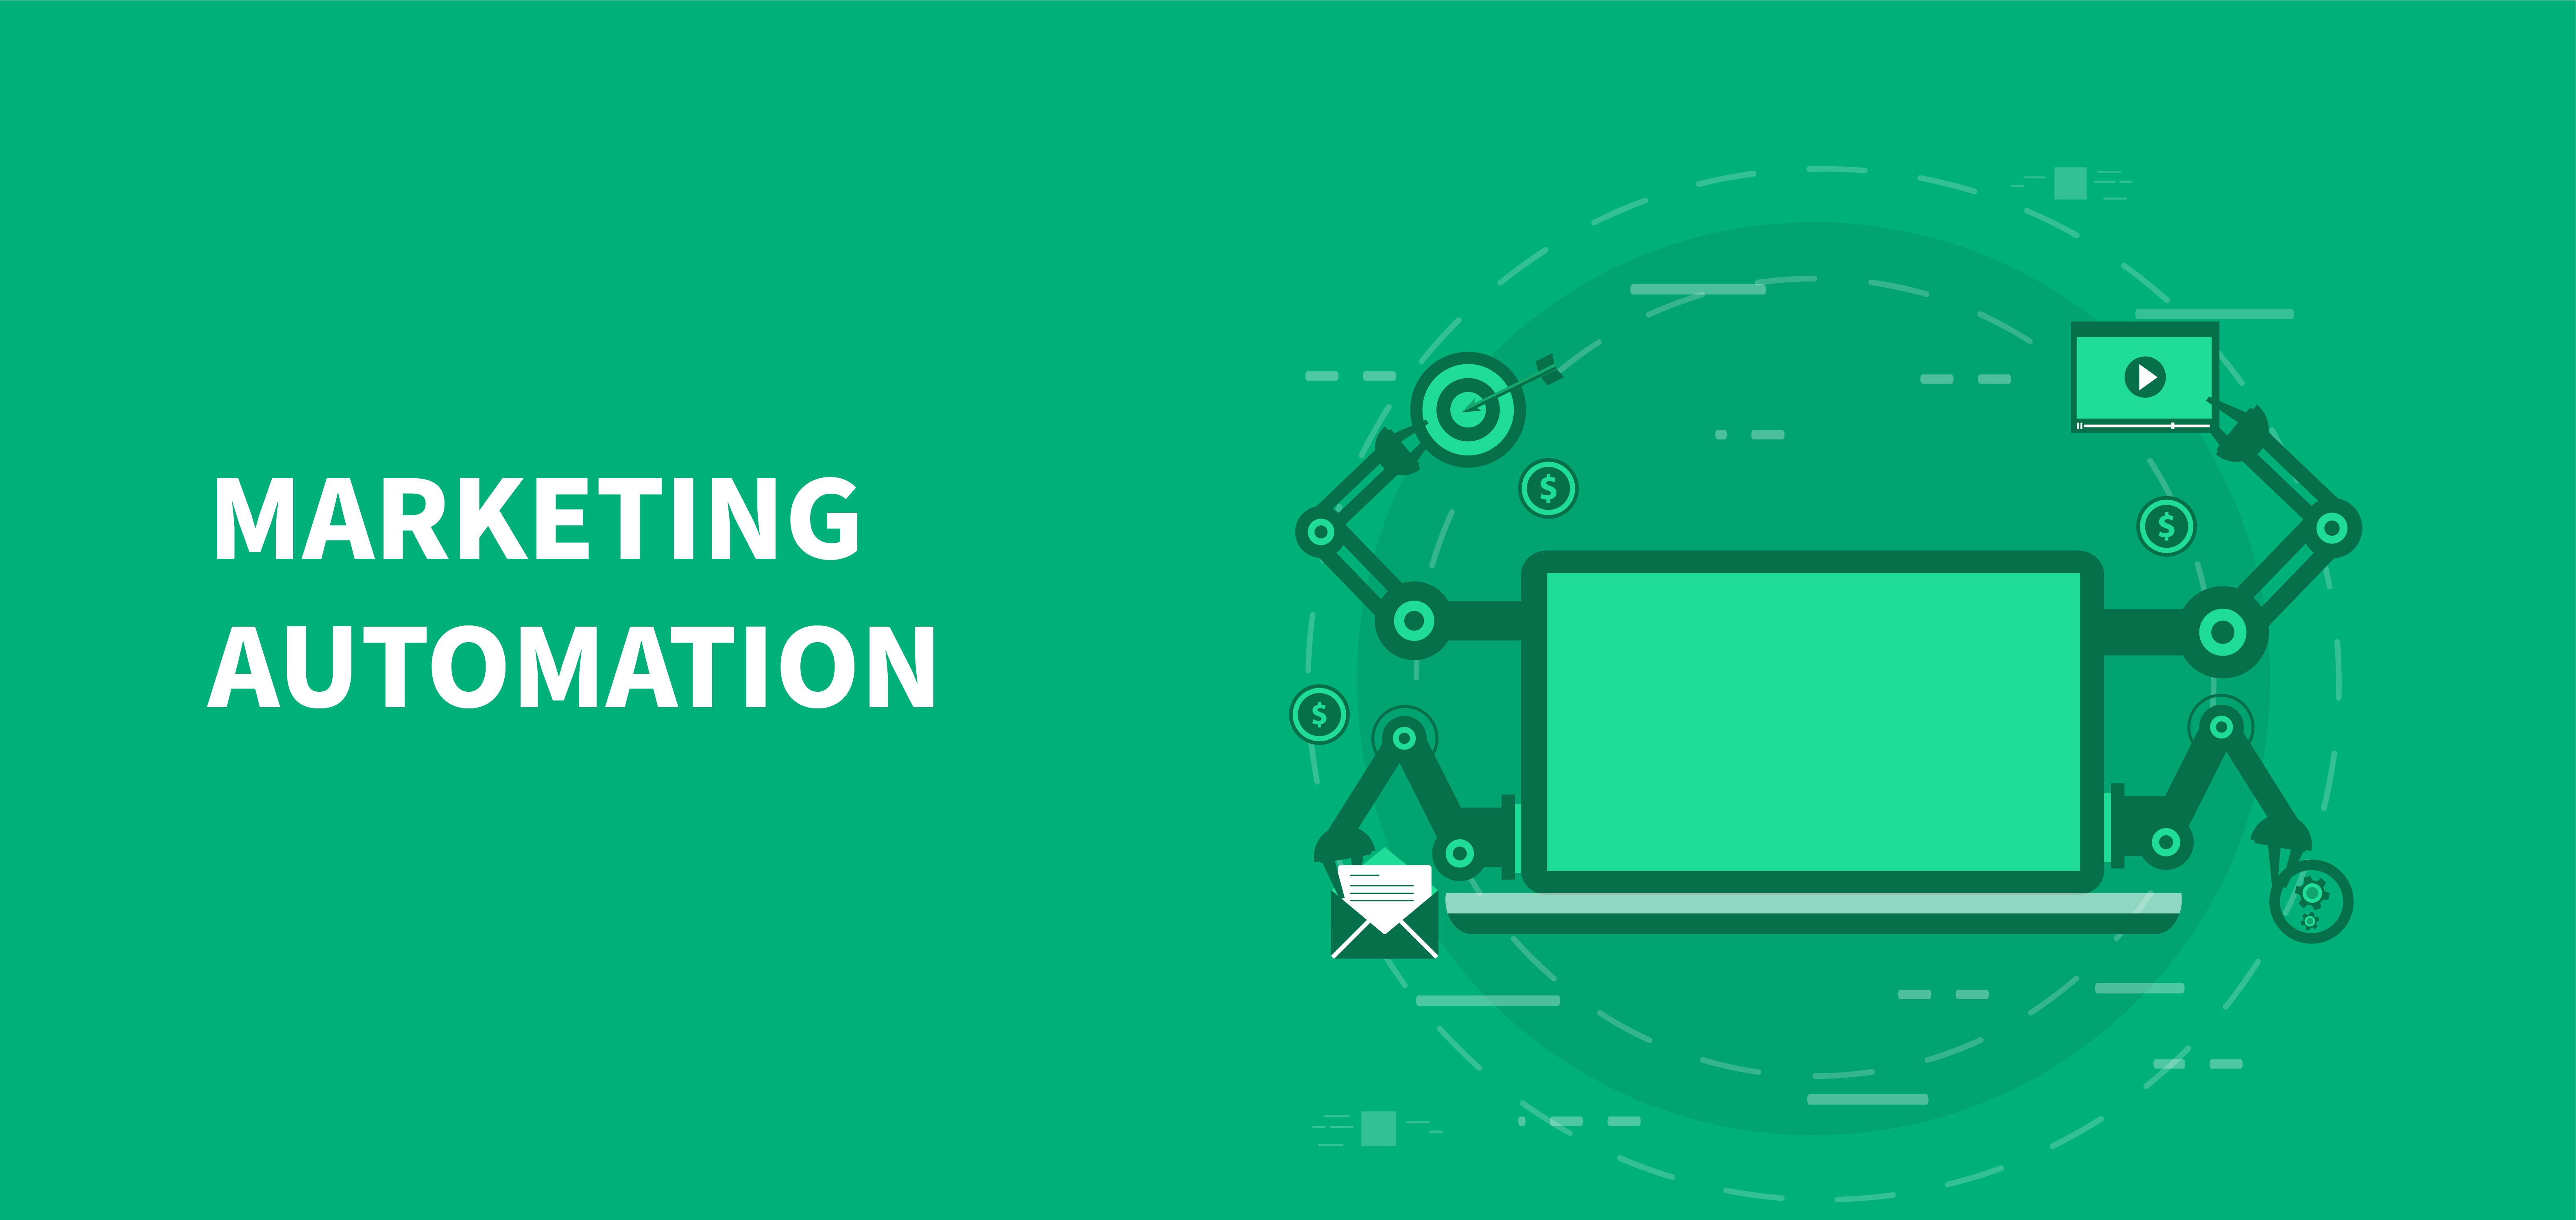 Marketing trends: Marketing Automation